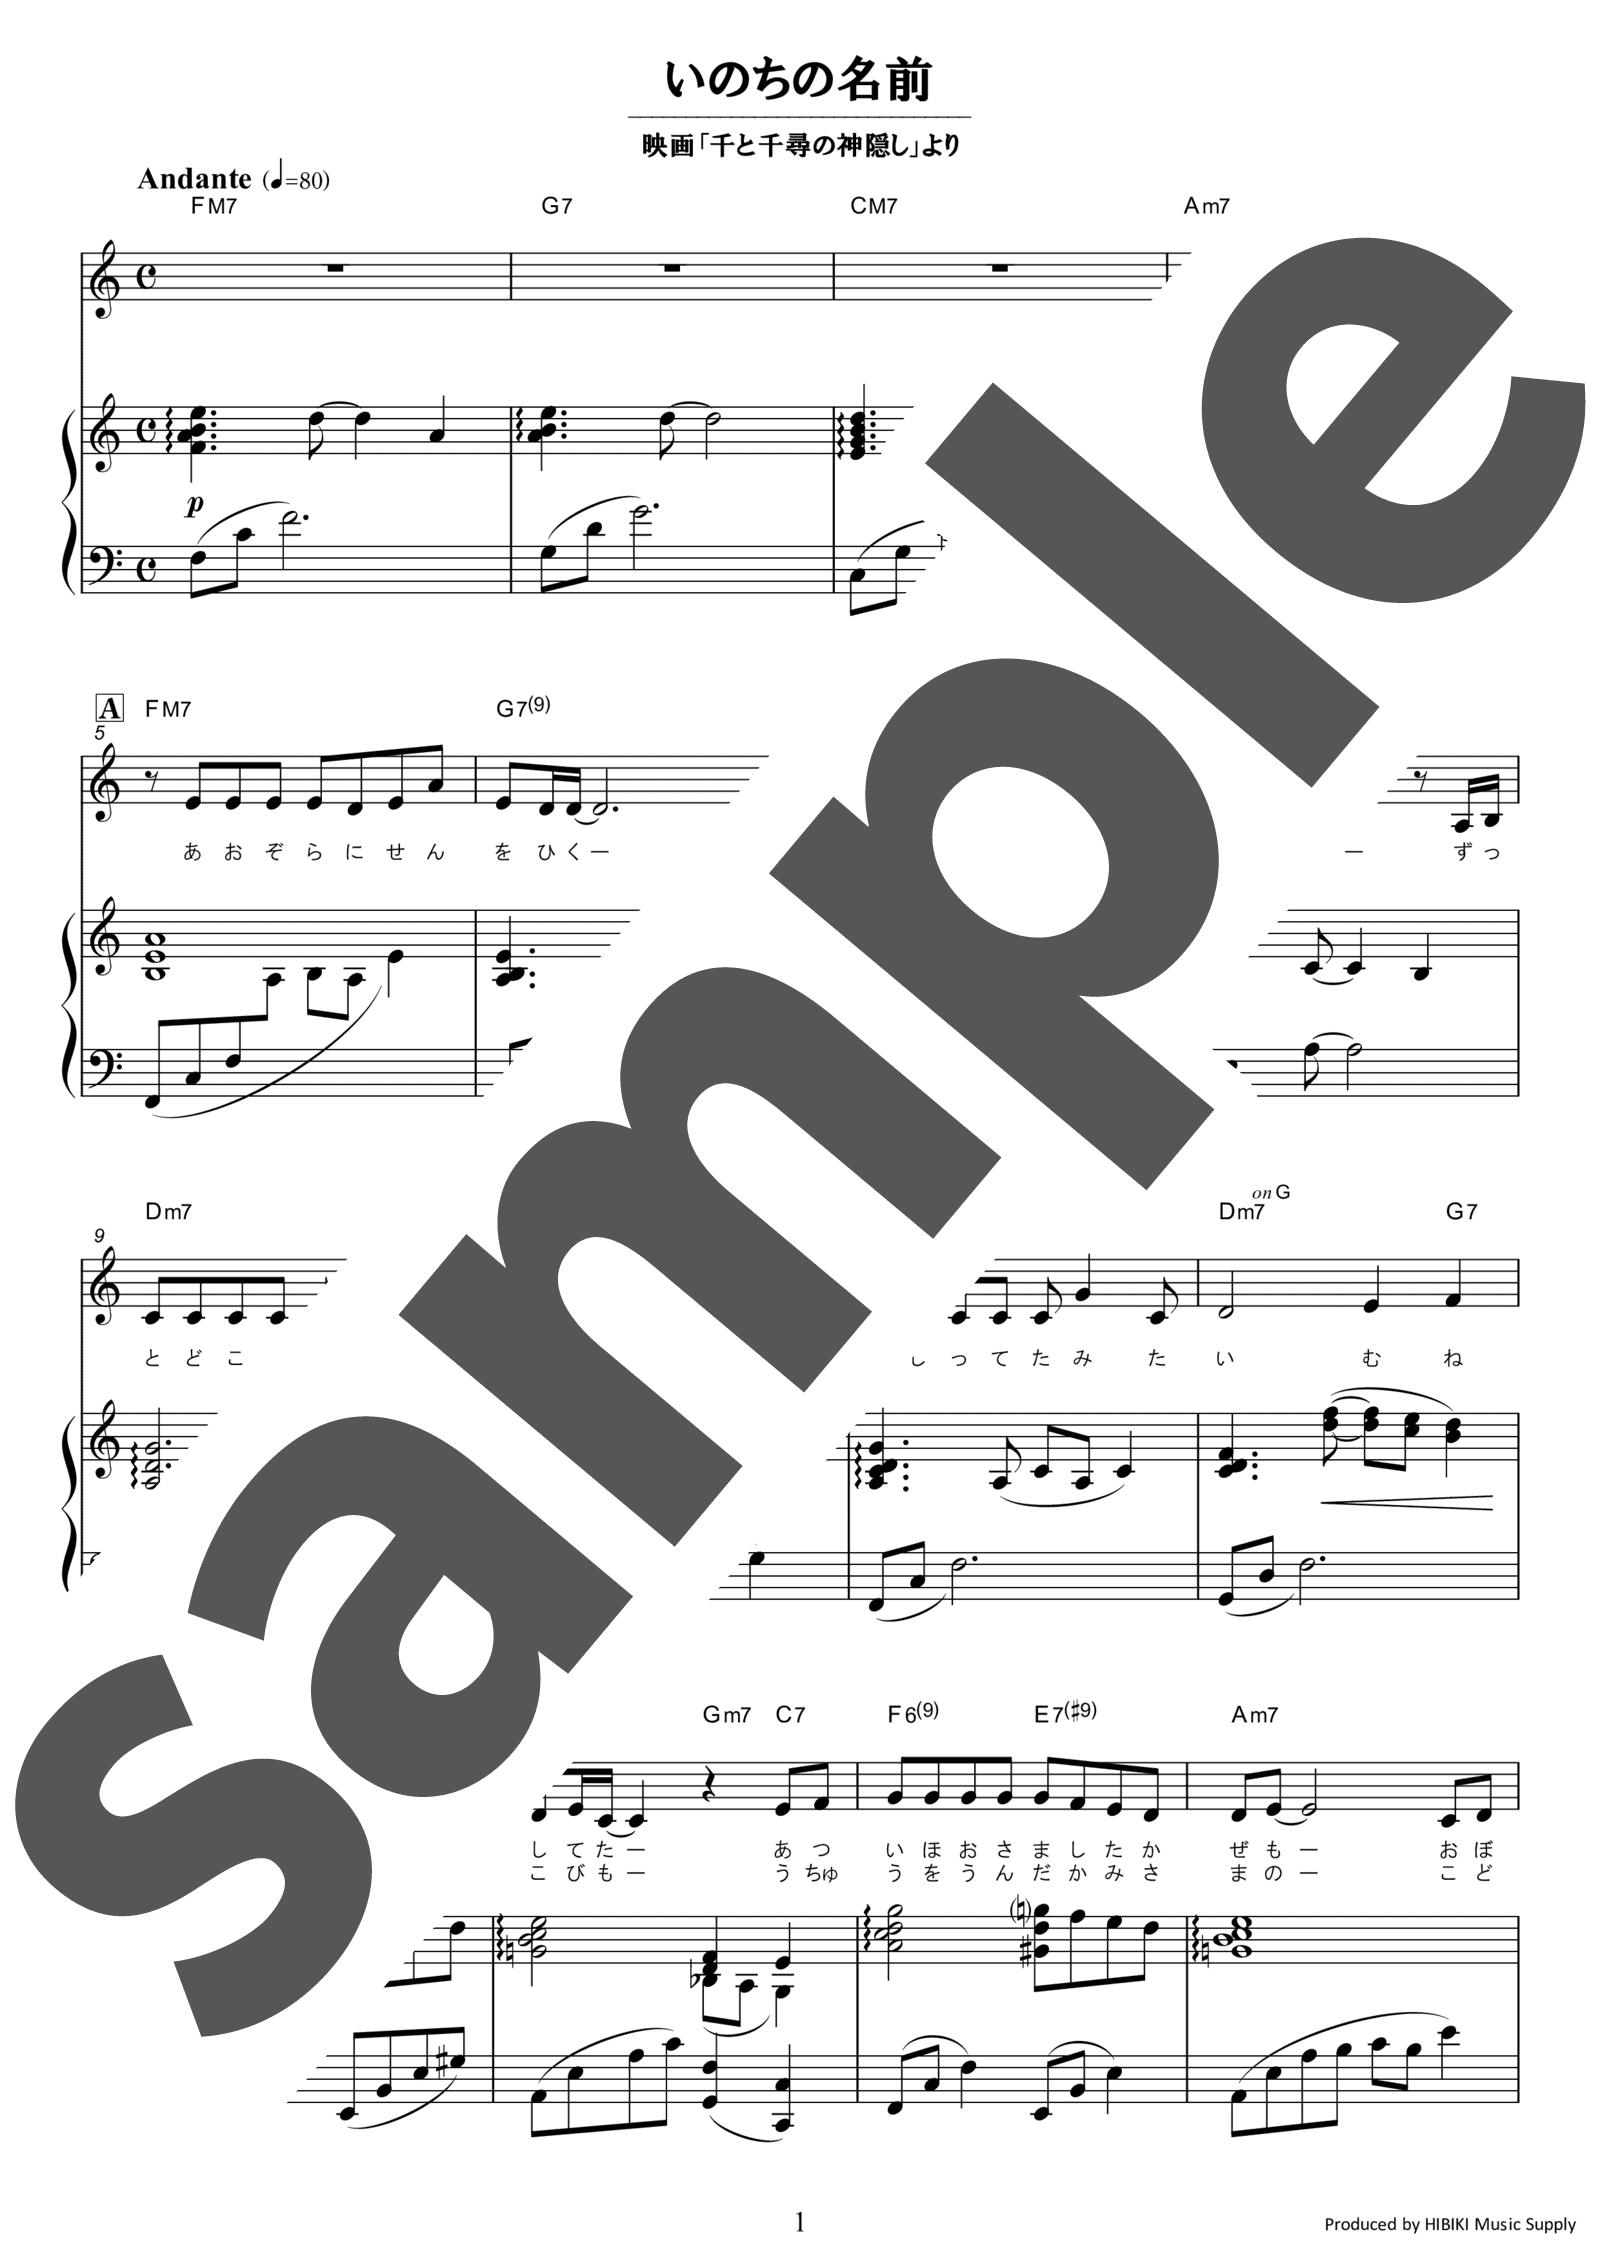 の 楽譜 いのち 名前